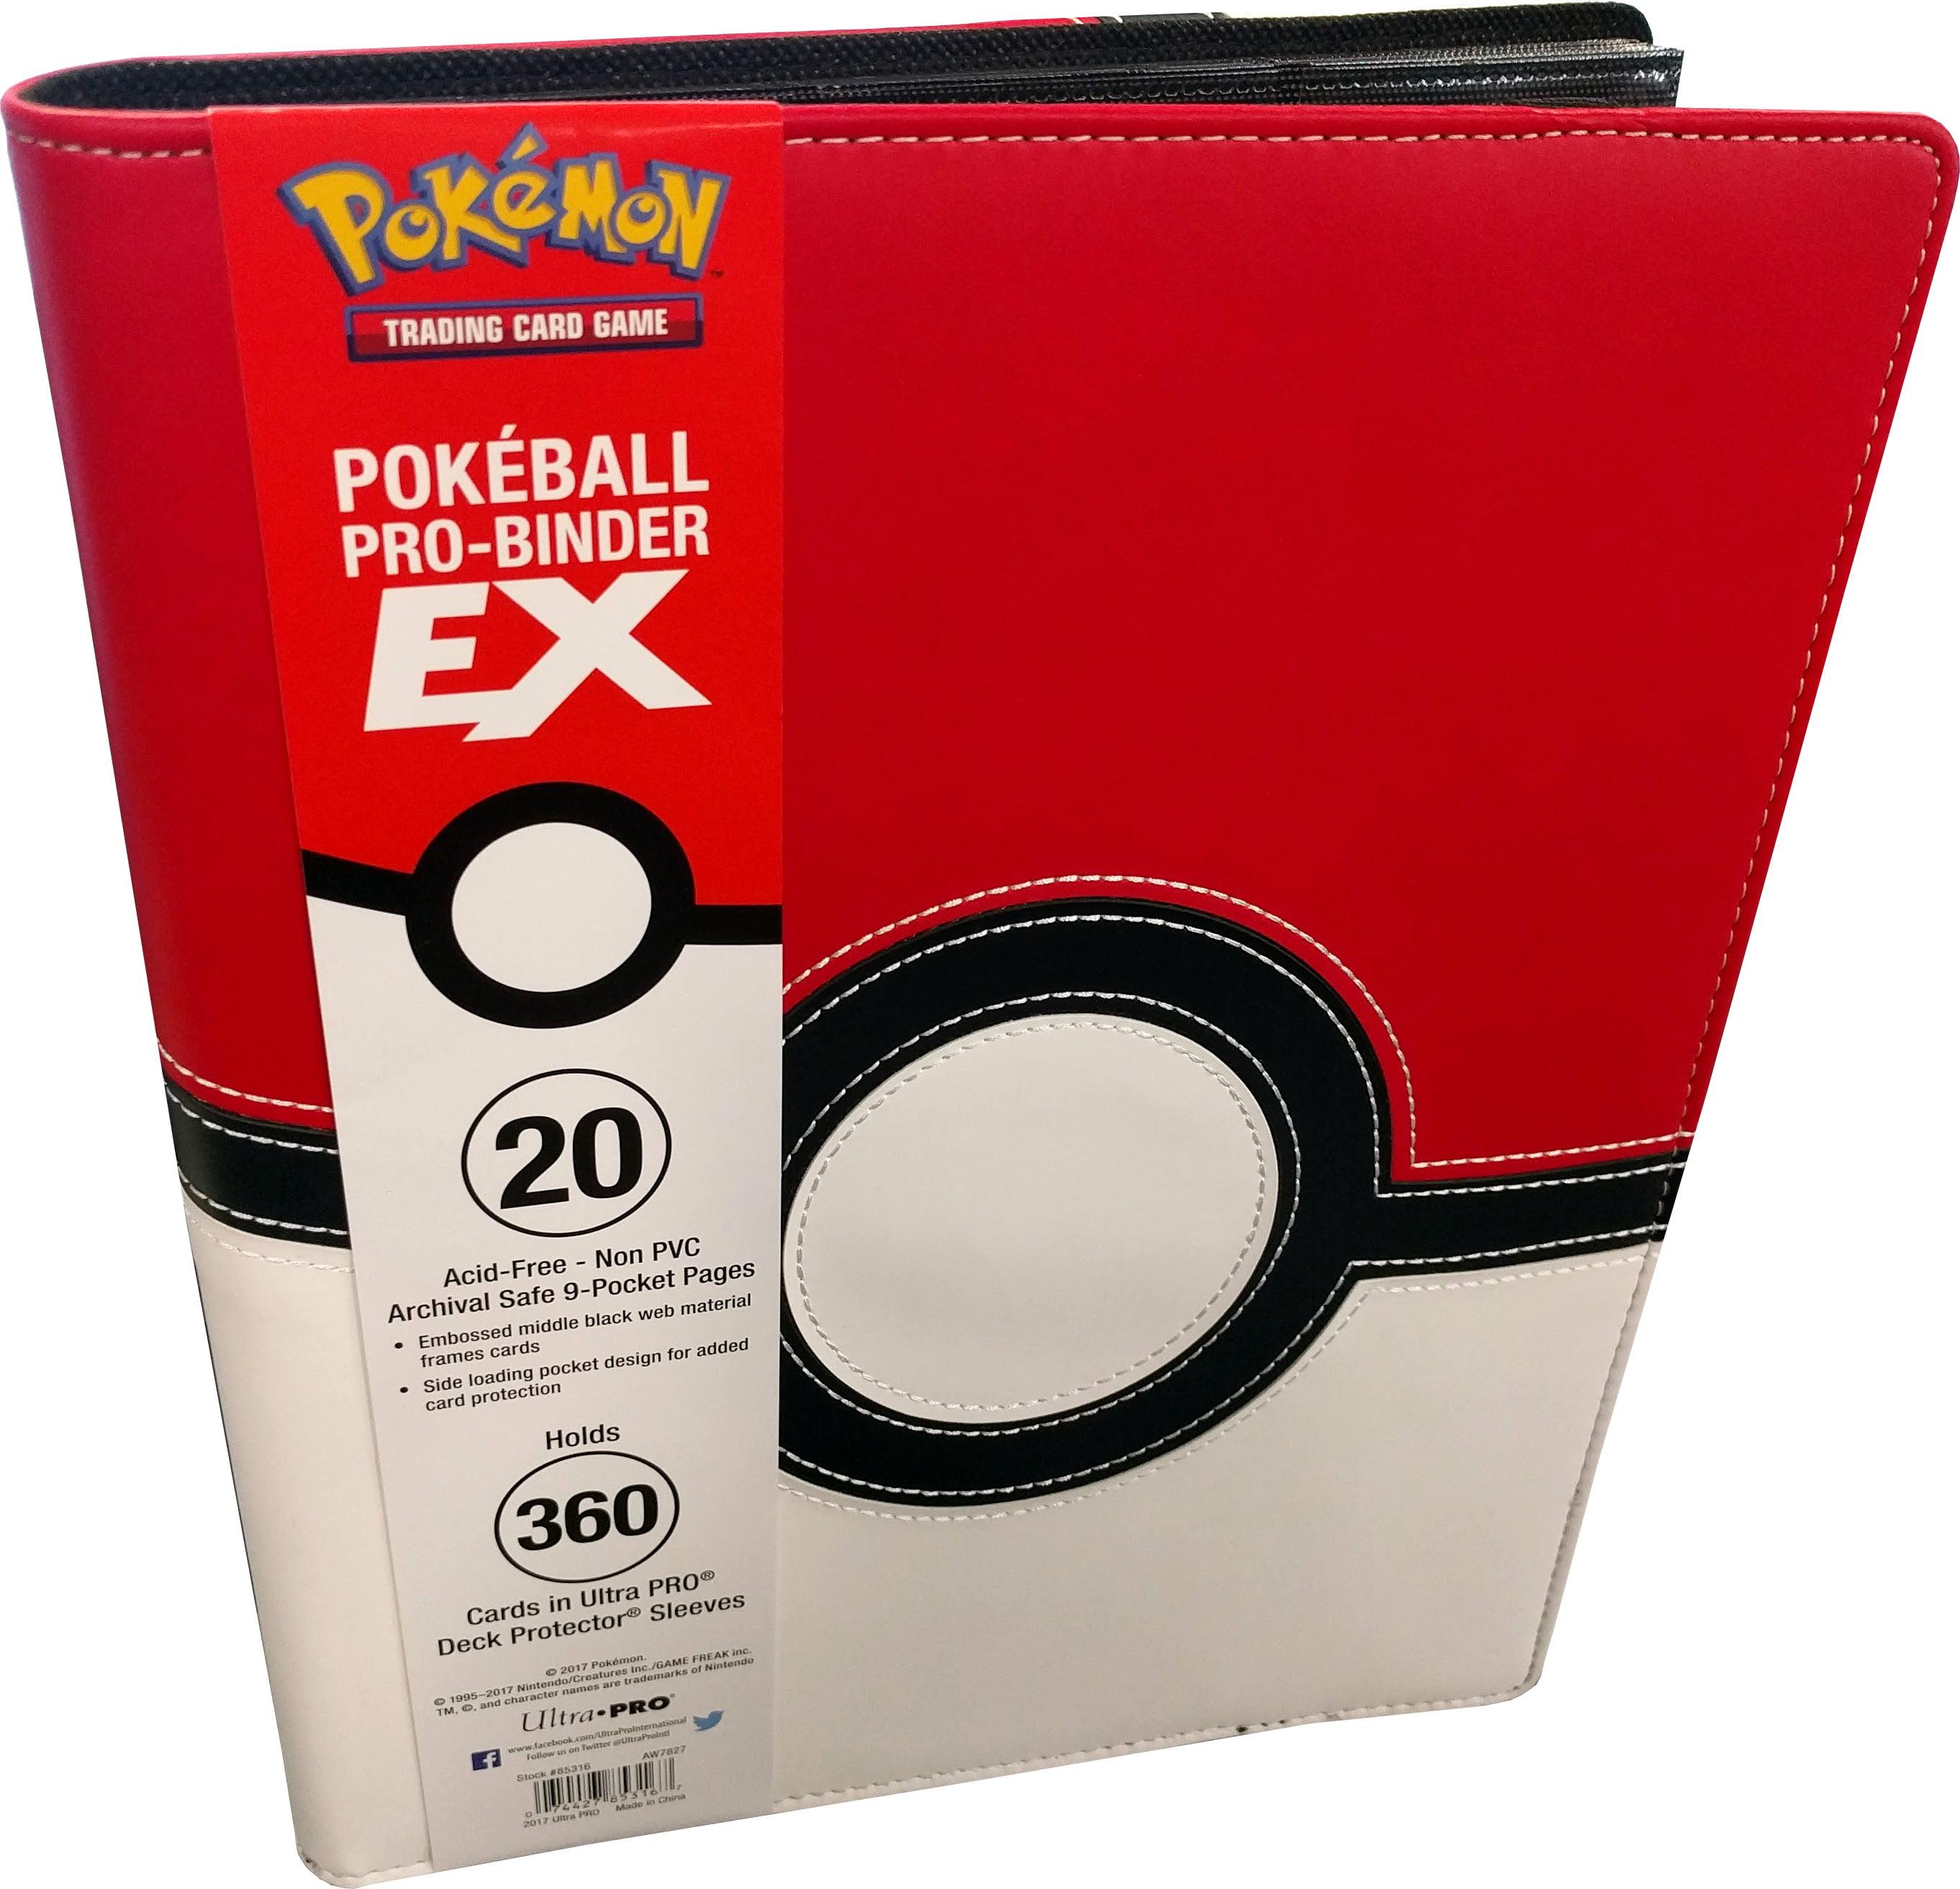 Ultra Pro Pokemon Pokeball Premium PRO 9 pocket Binder